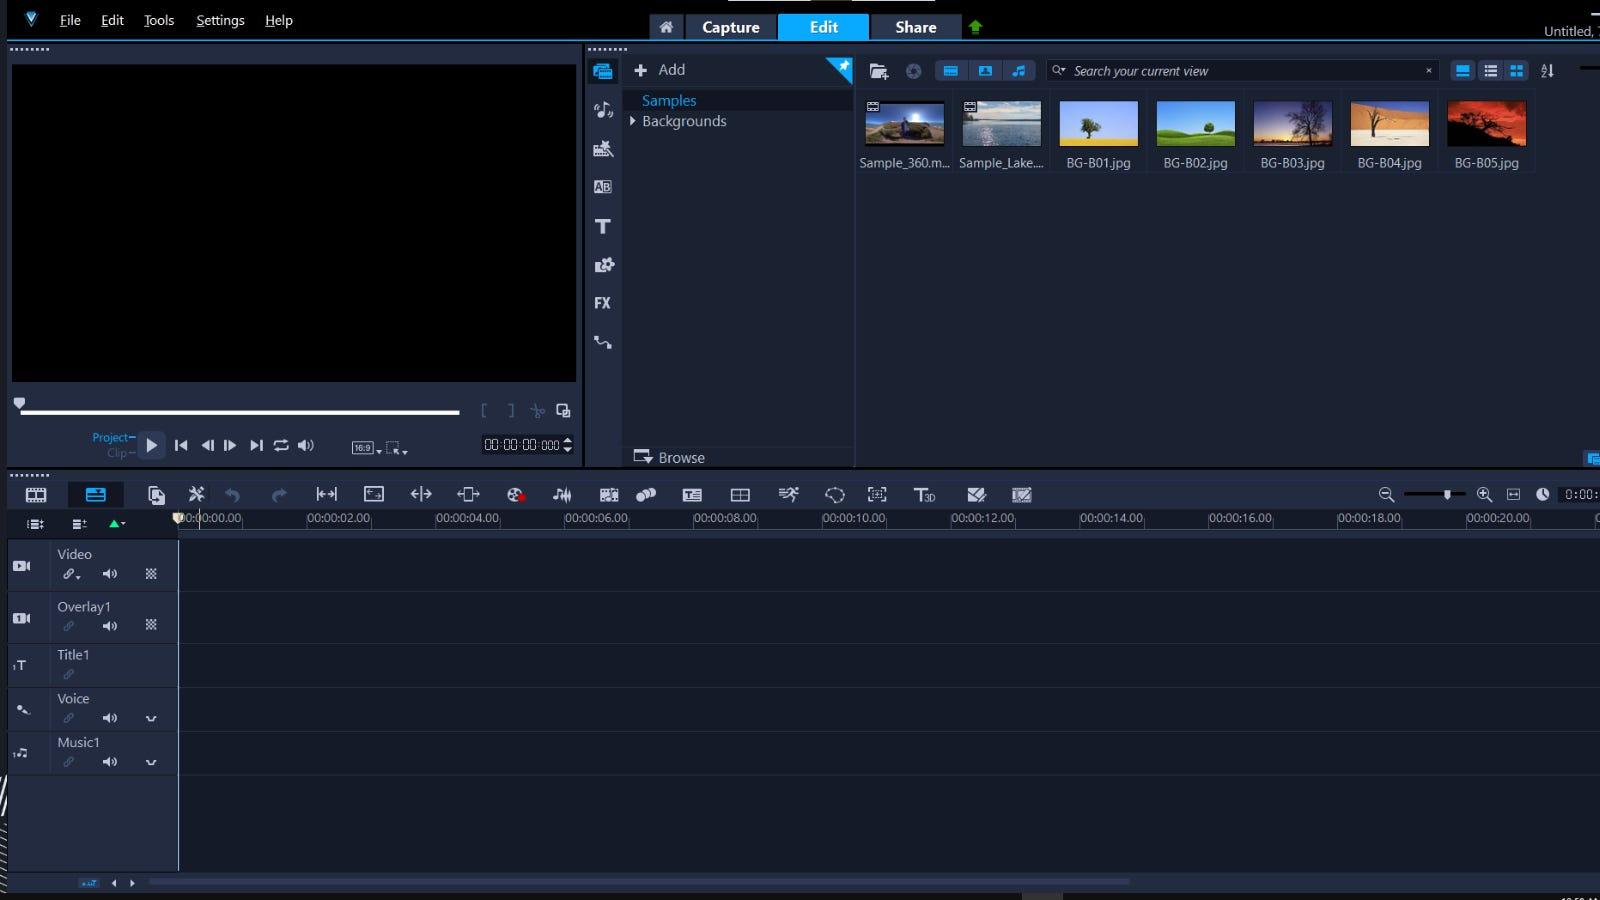 VideoStudio Pro main editing window